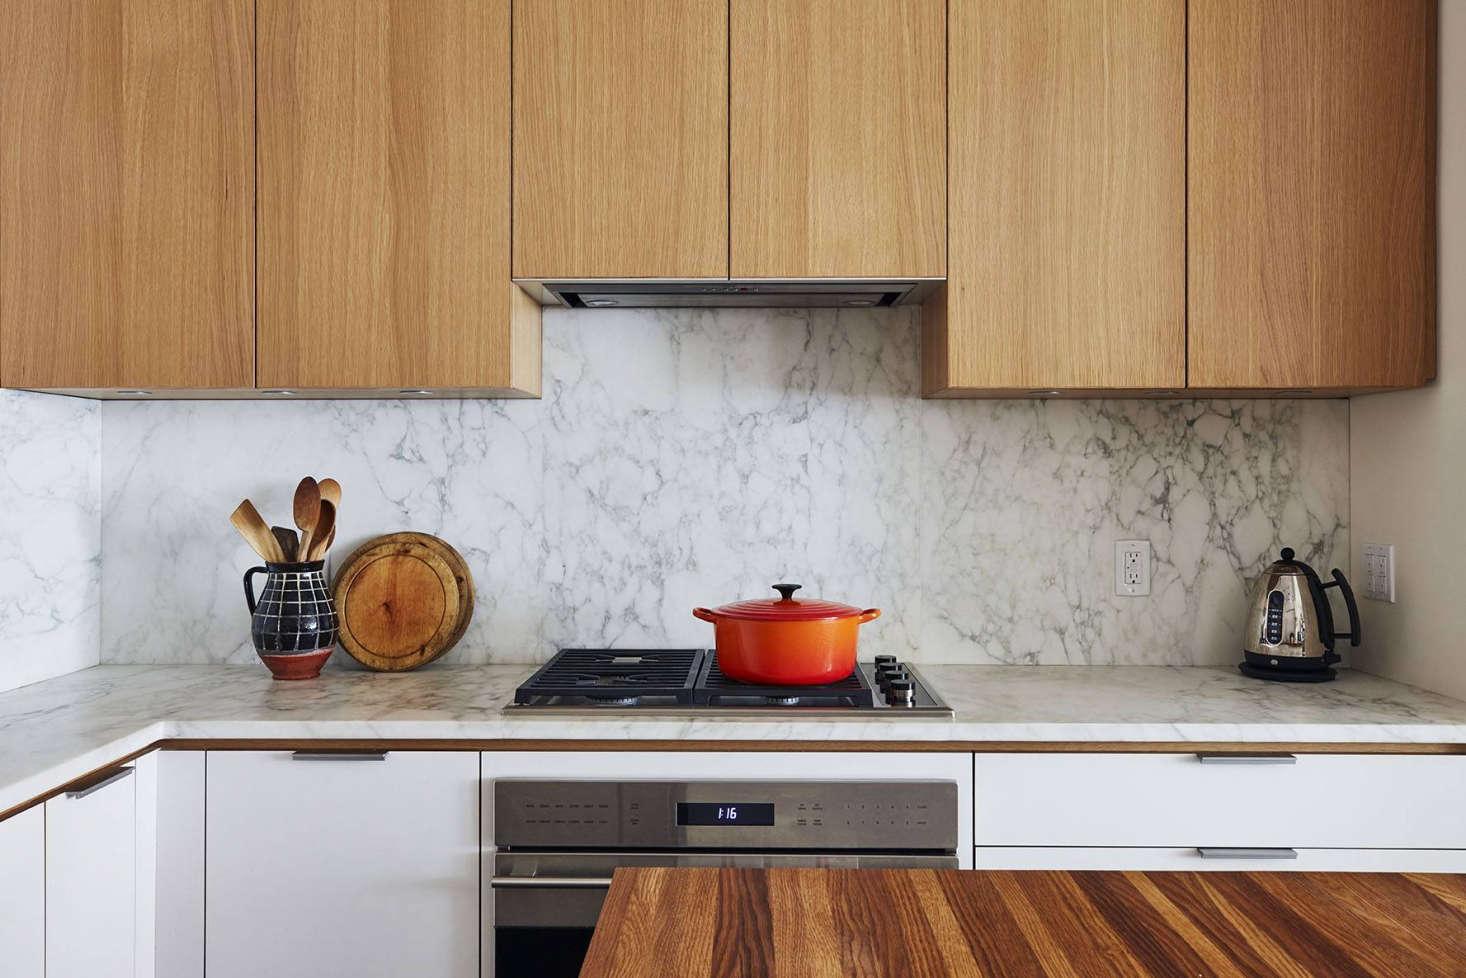 Appliances include aWolf 30-Inch E Series Transitional Built-In Oven, aWolf 30-Inch Transitional Gas Cooktop, and aFuturo 3